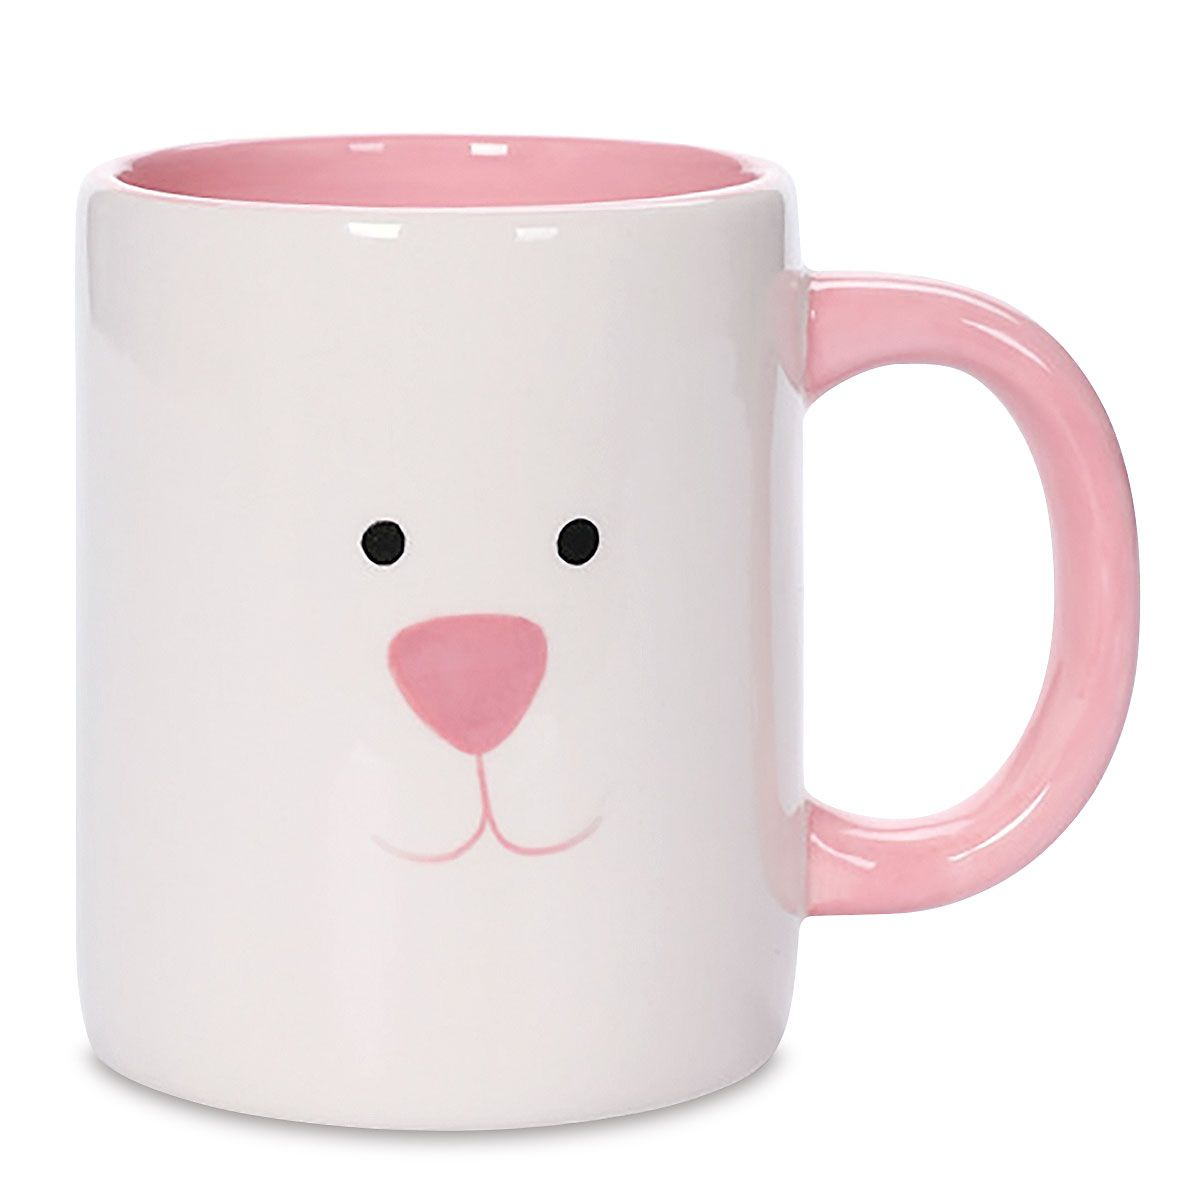 Bunny Face Mug